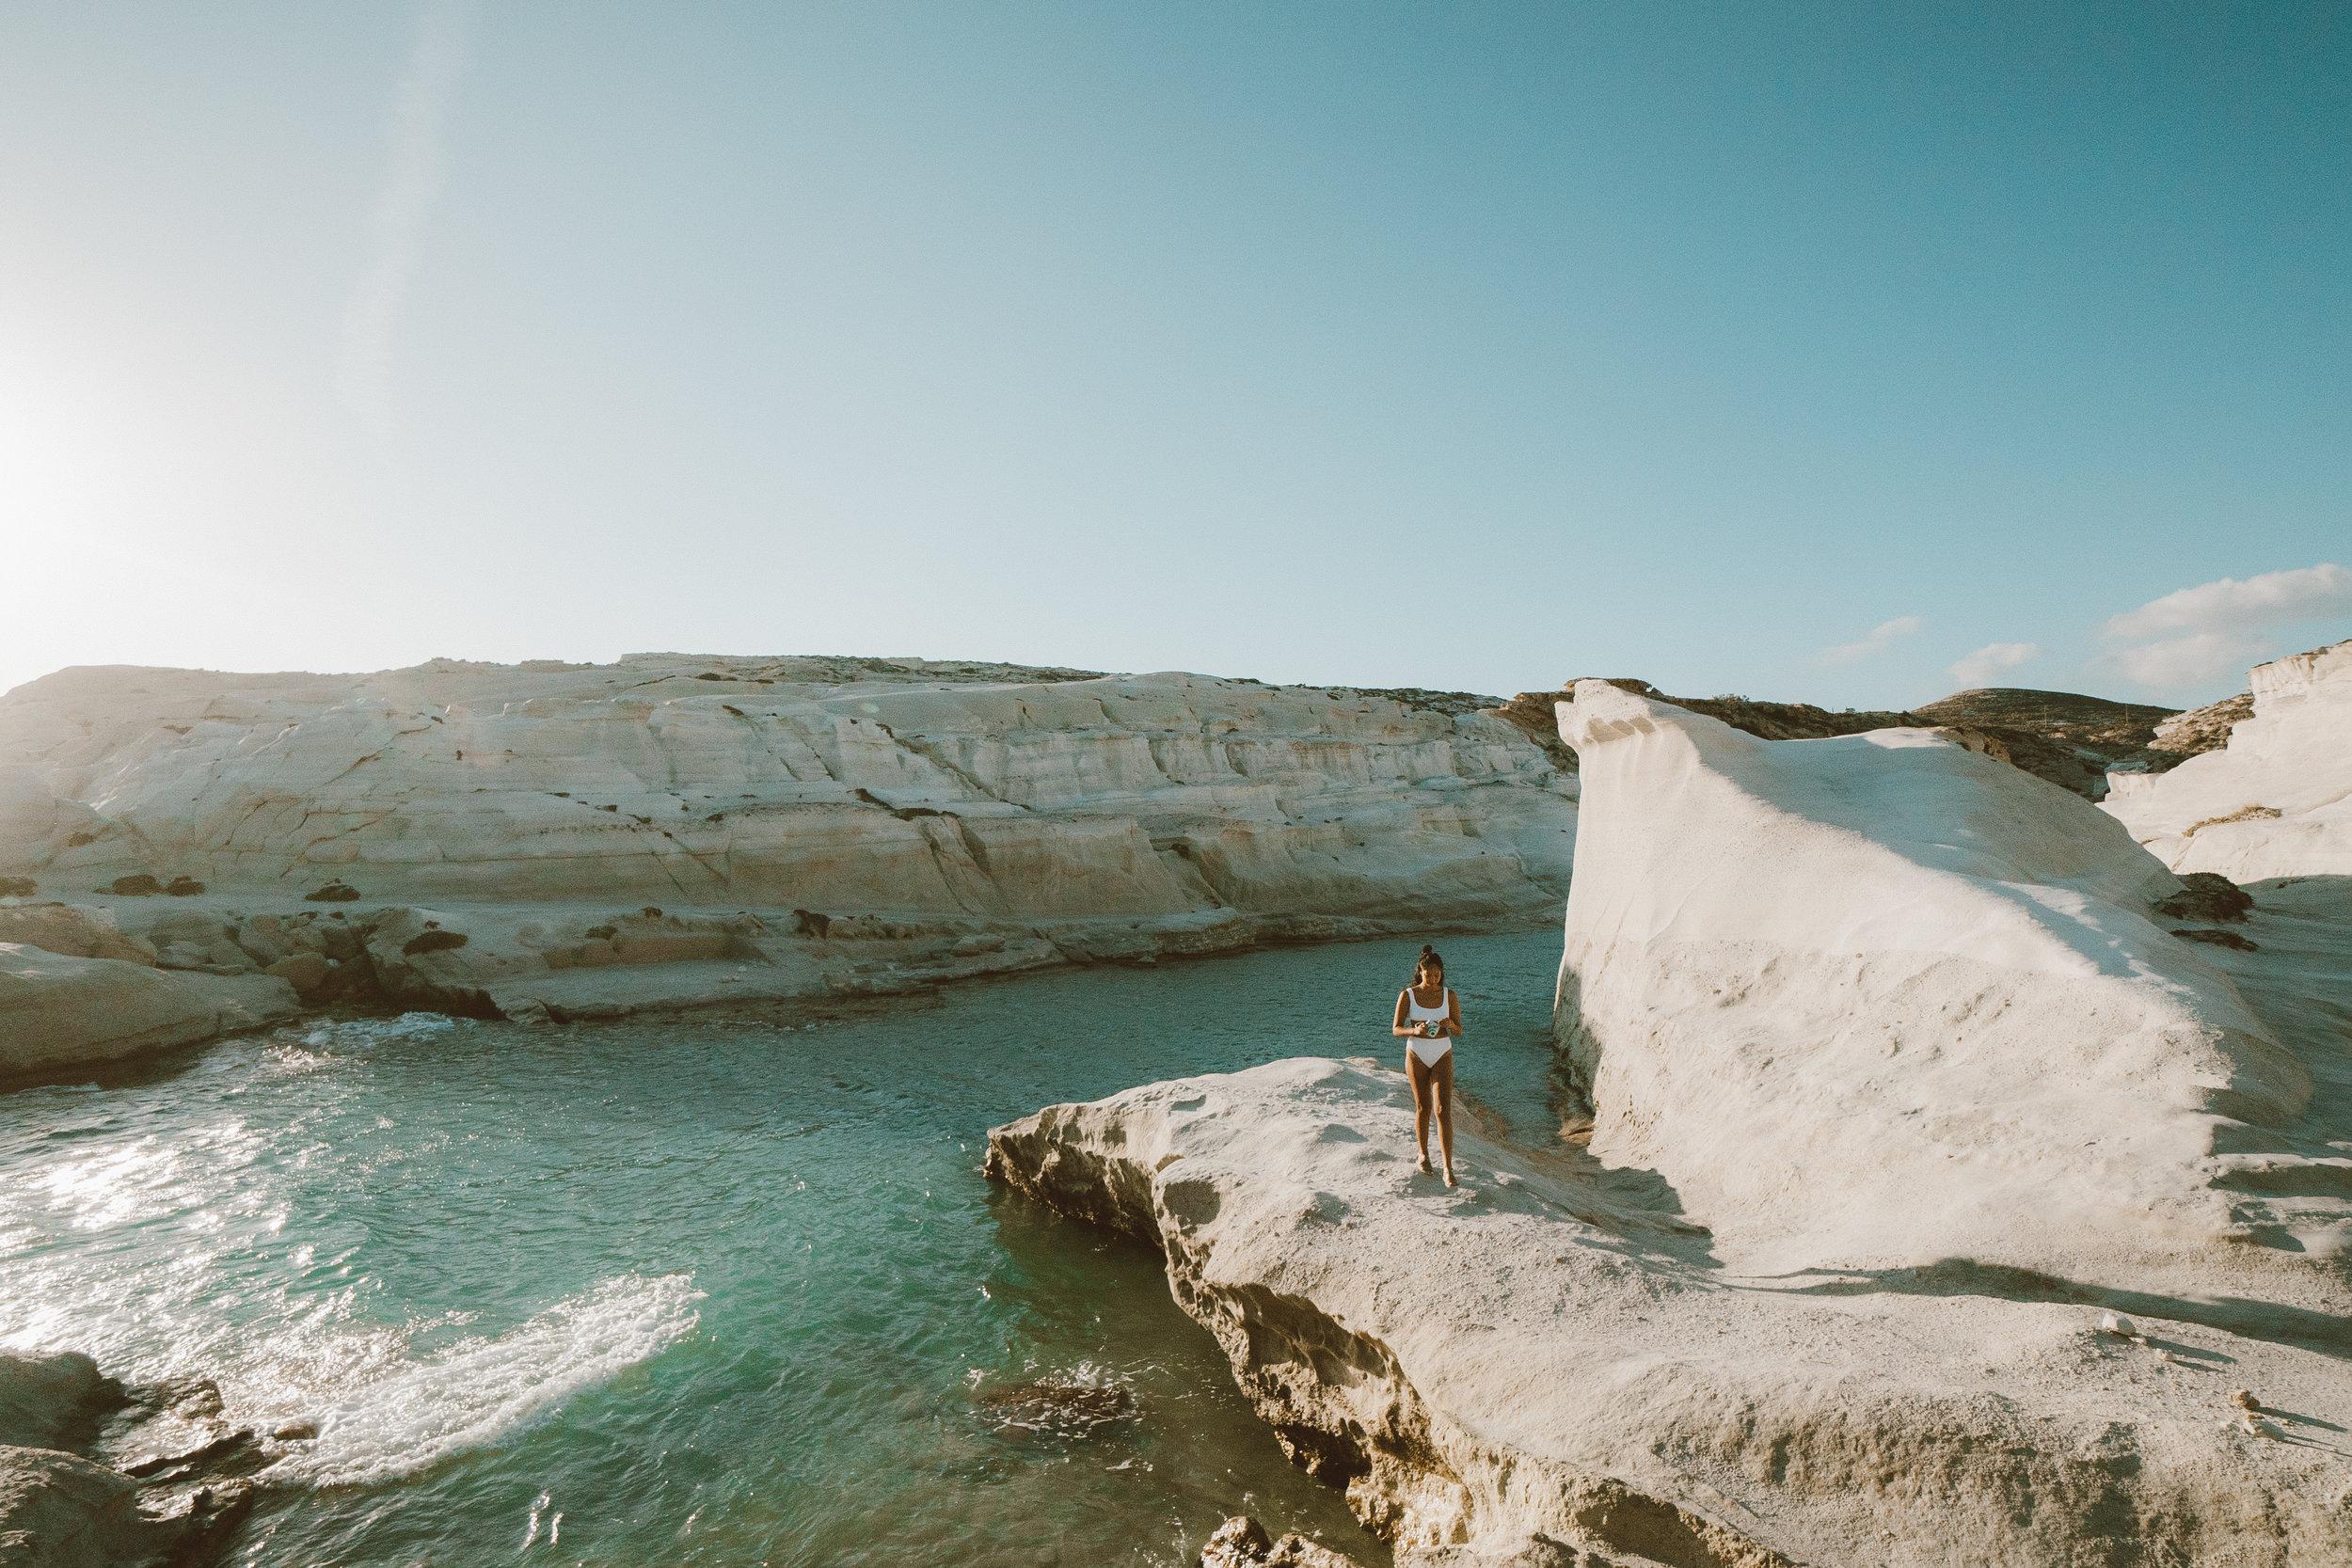 Mel in a white bikini standing by the sea on Sarakiniko Beach in Milos, Greece, holding a polaroid camera